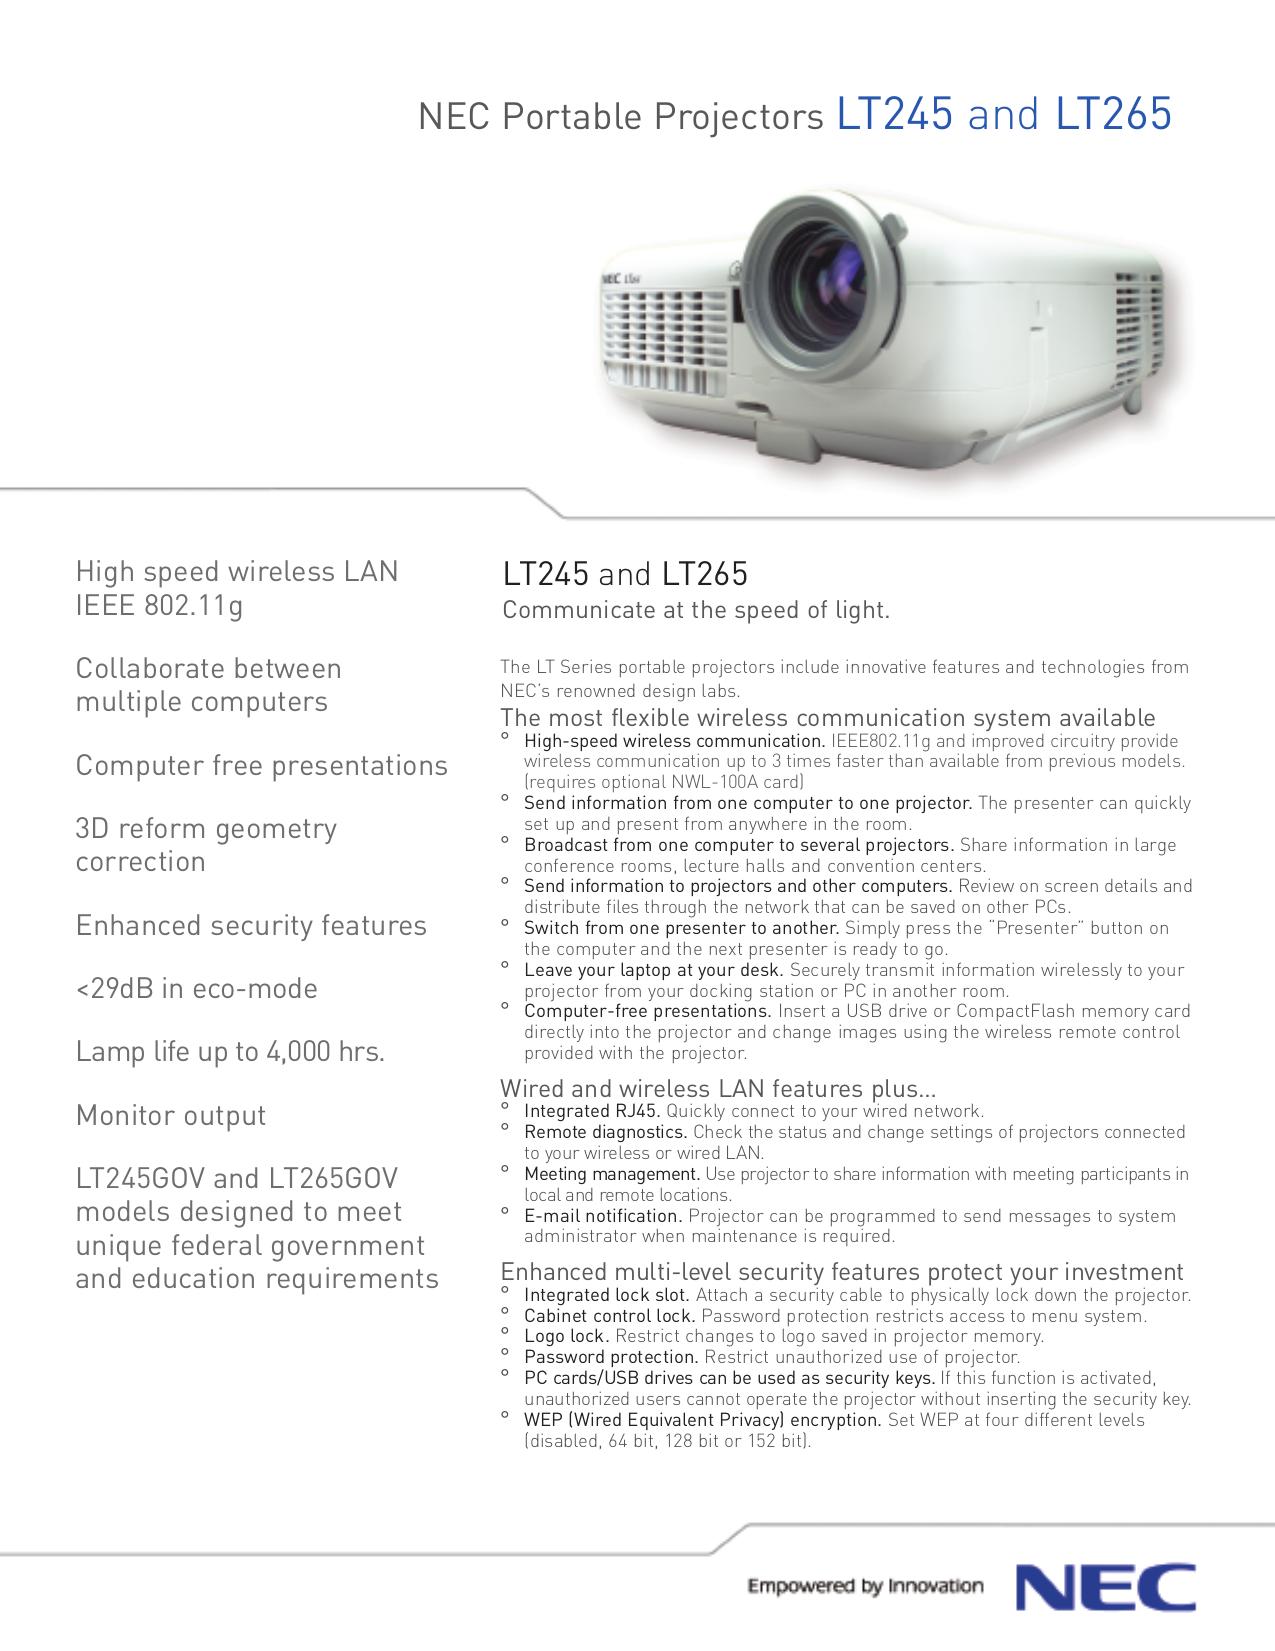 nec lt245 manual browse manual guides u2022 rh trufflefries co NEC SV8100 Logo NEC SV 8100 Manual